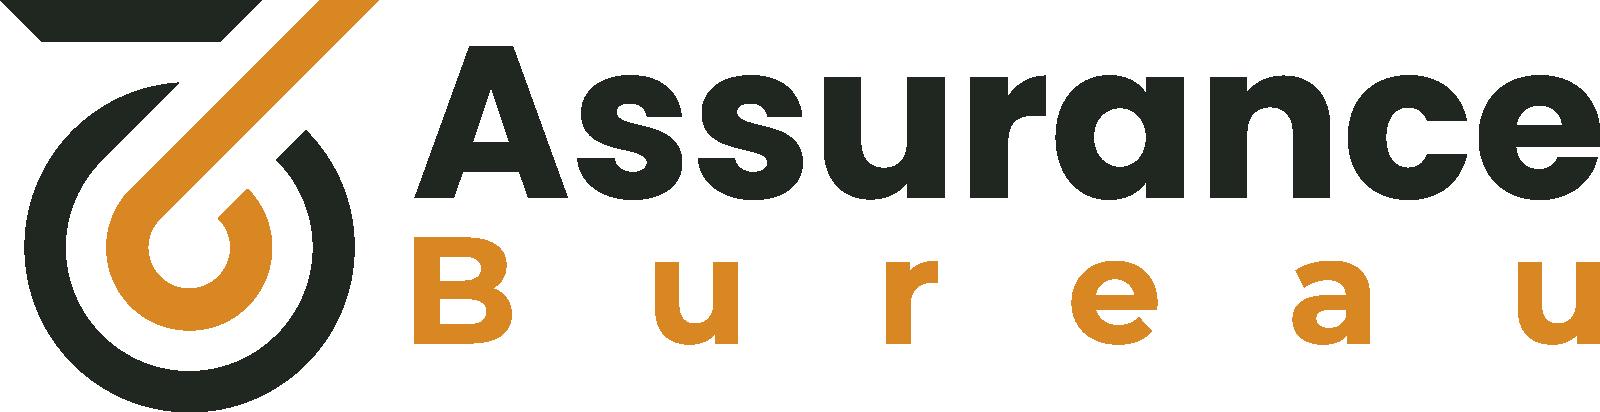 360 Assurance Bureau